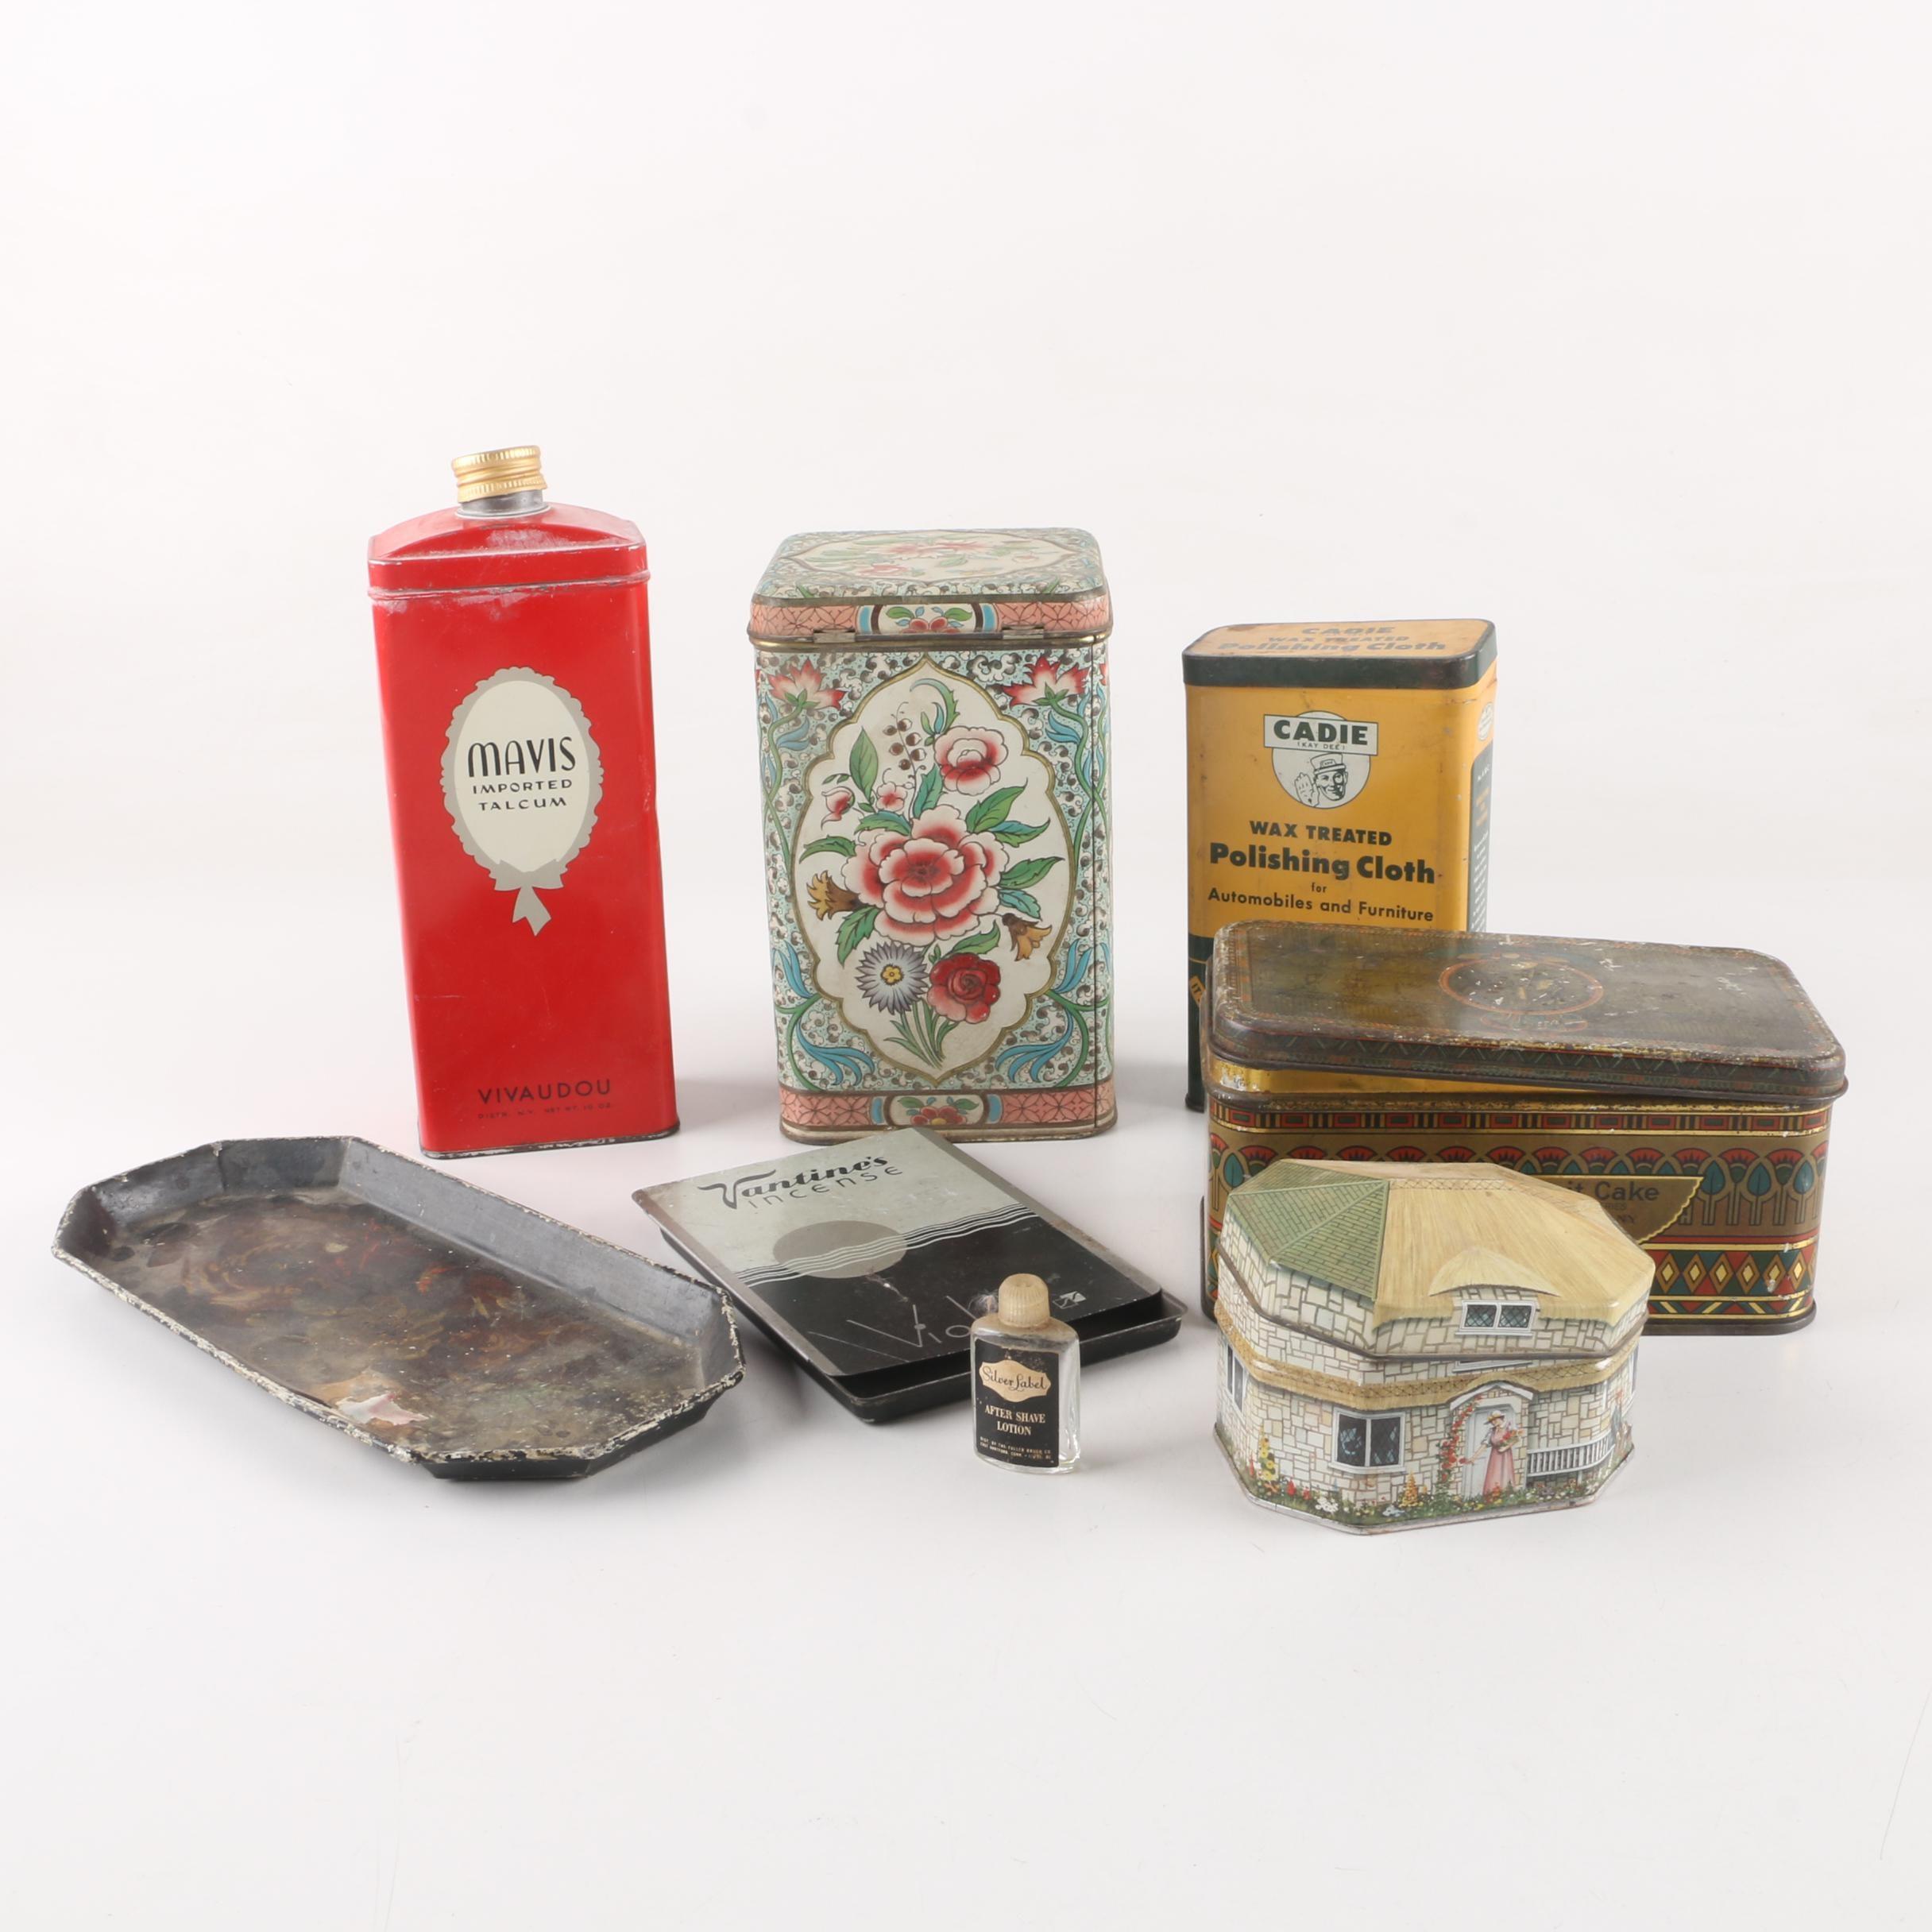 Mavis Talcum Tin and Assorted Vintage Tins